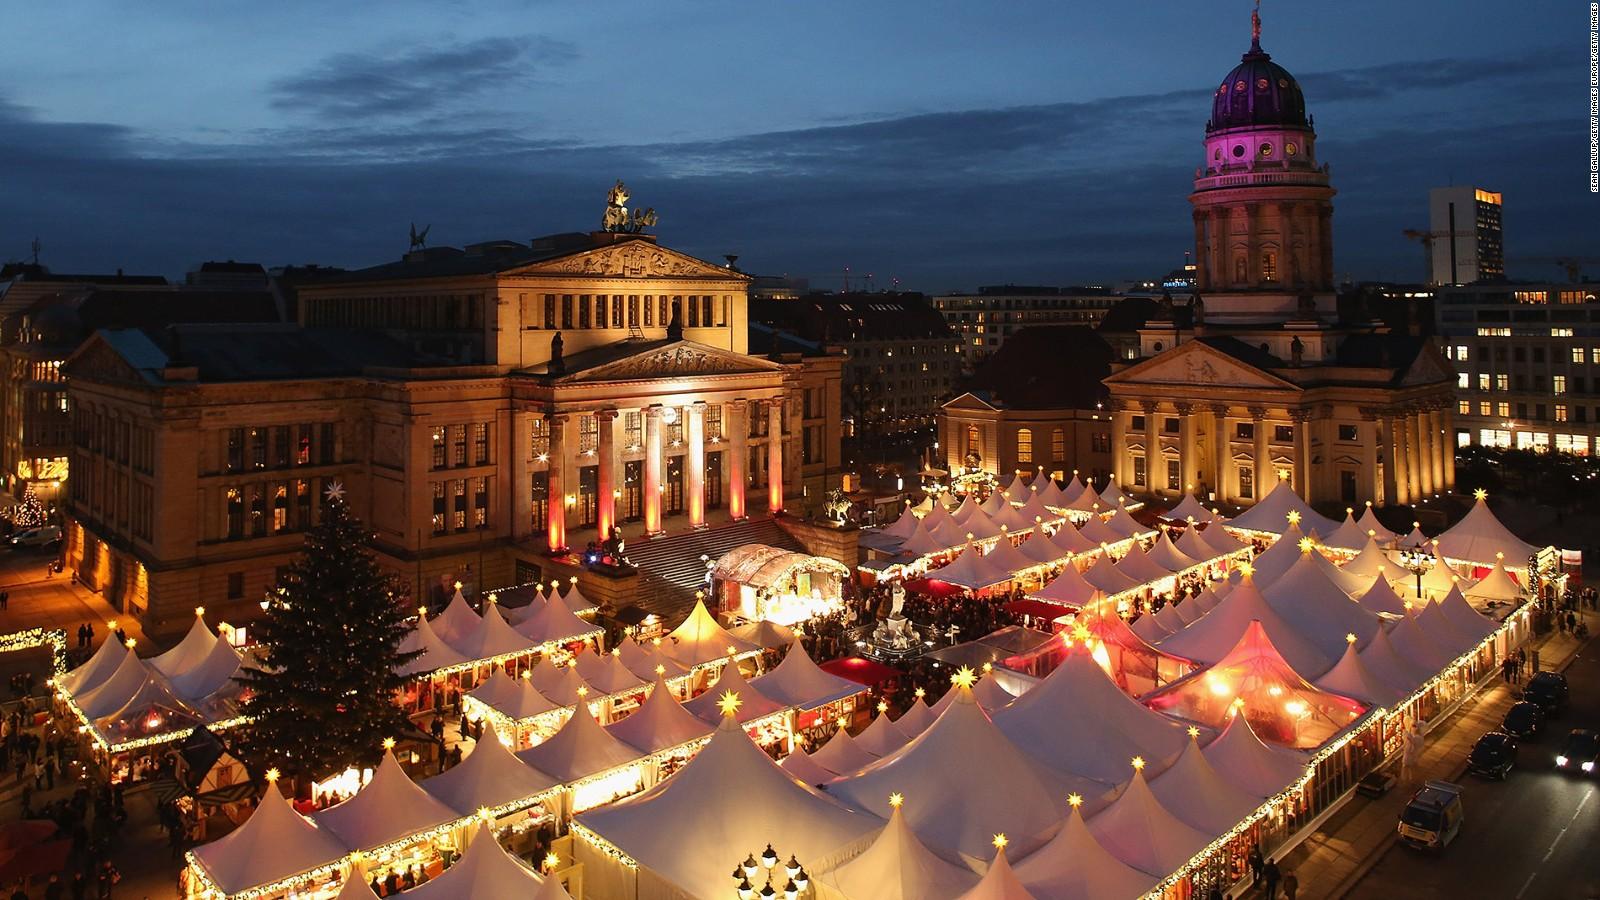 Christmas In Europe Wallpaper.17 Best Christmas Markets Around The World Cnn Travel